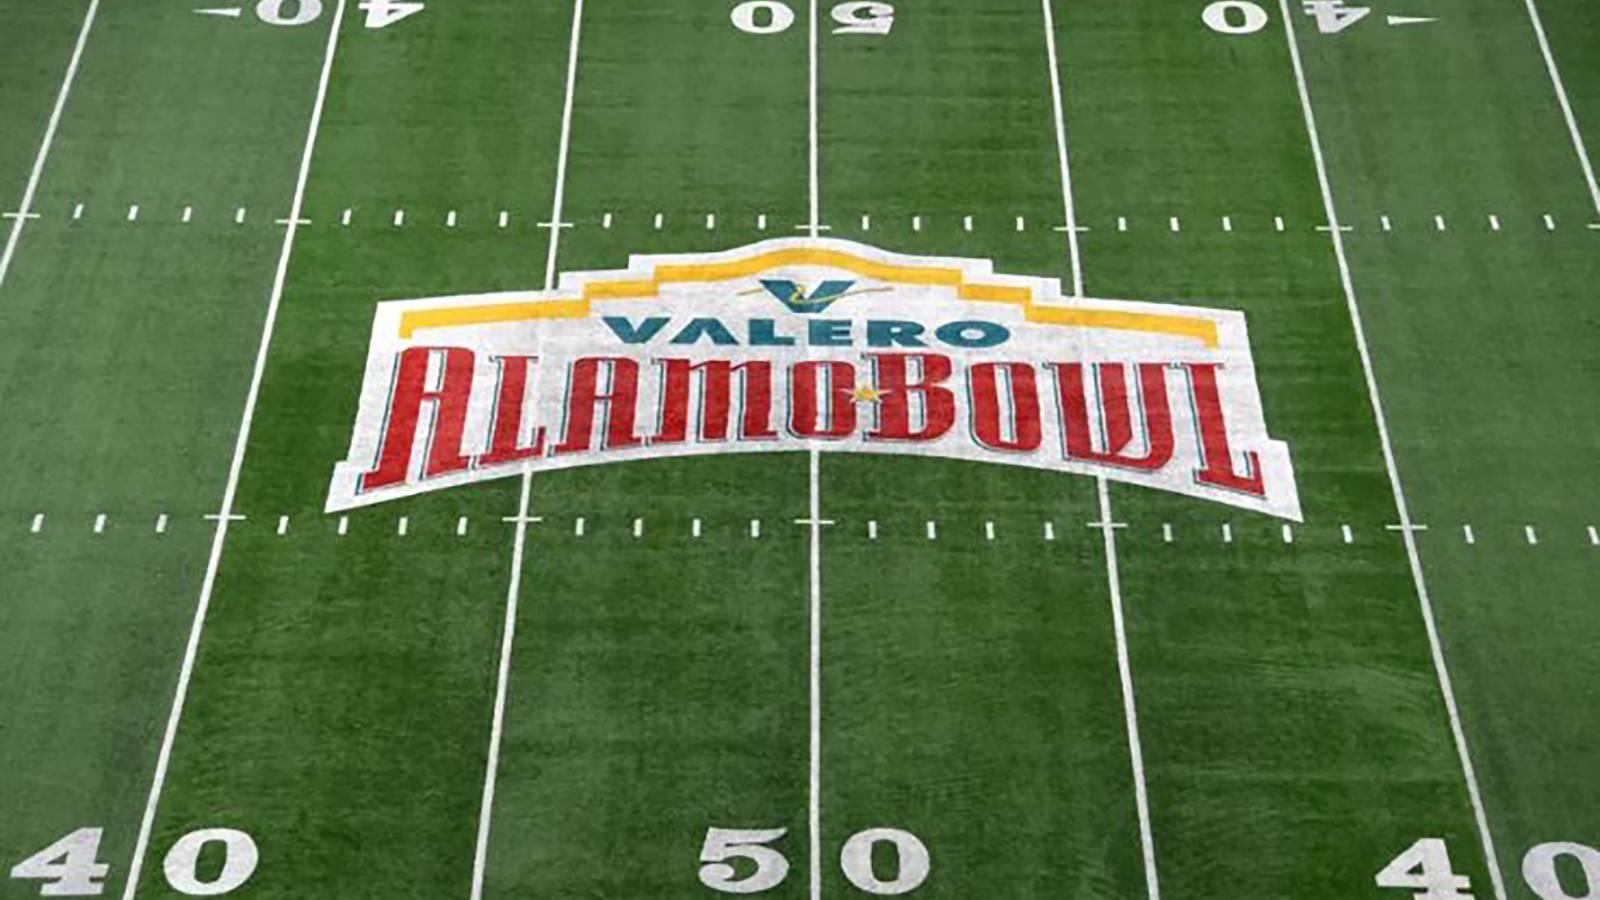 2020 Alamo Bowl (Date TBD)